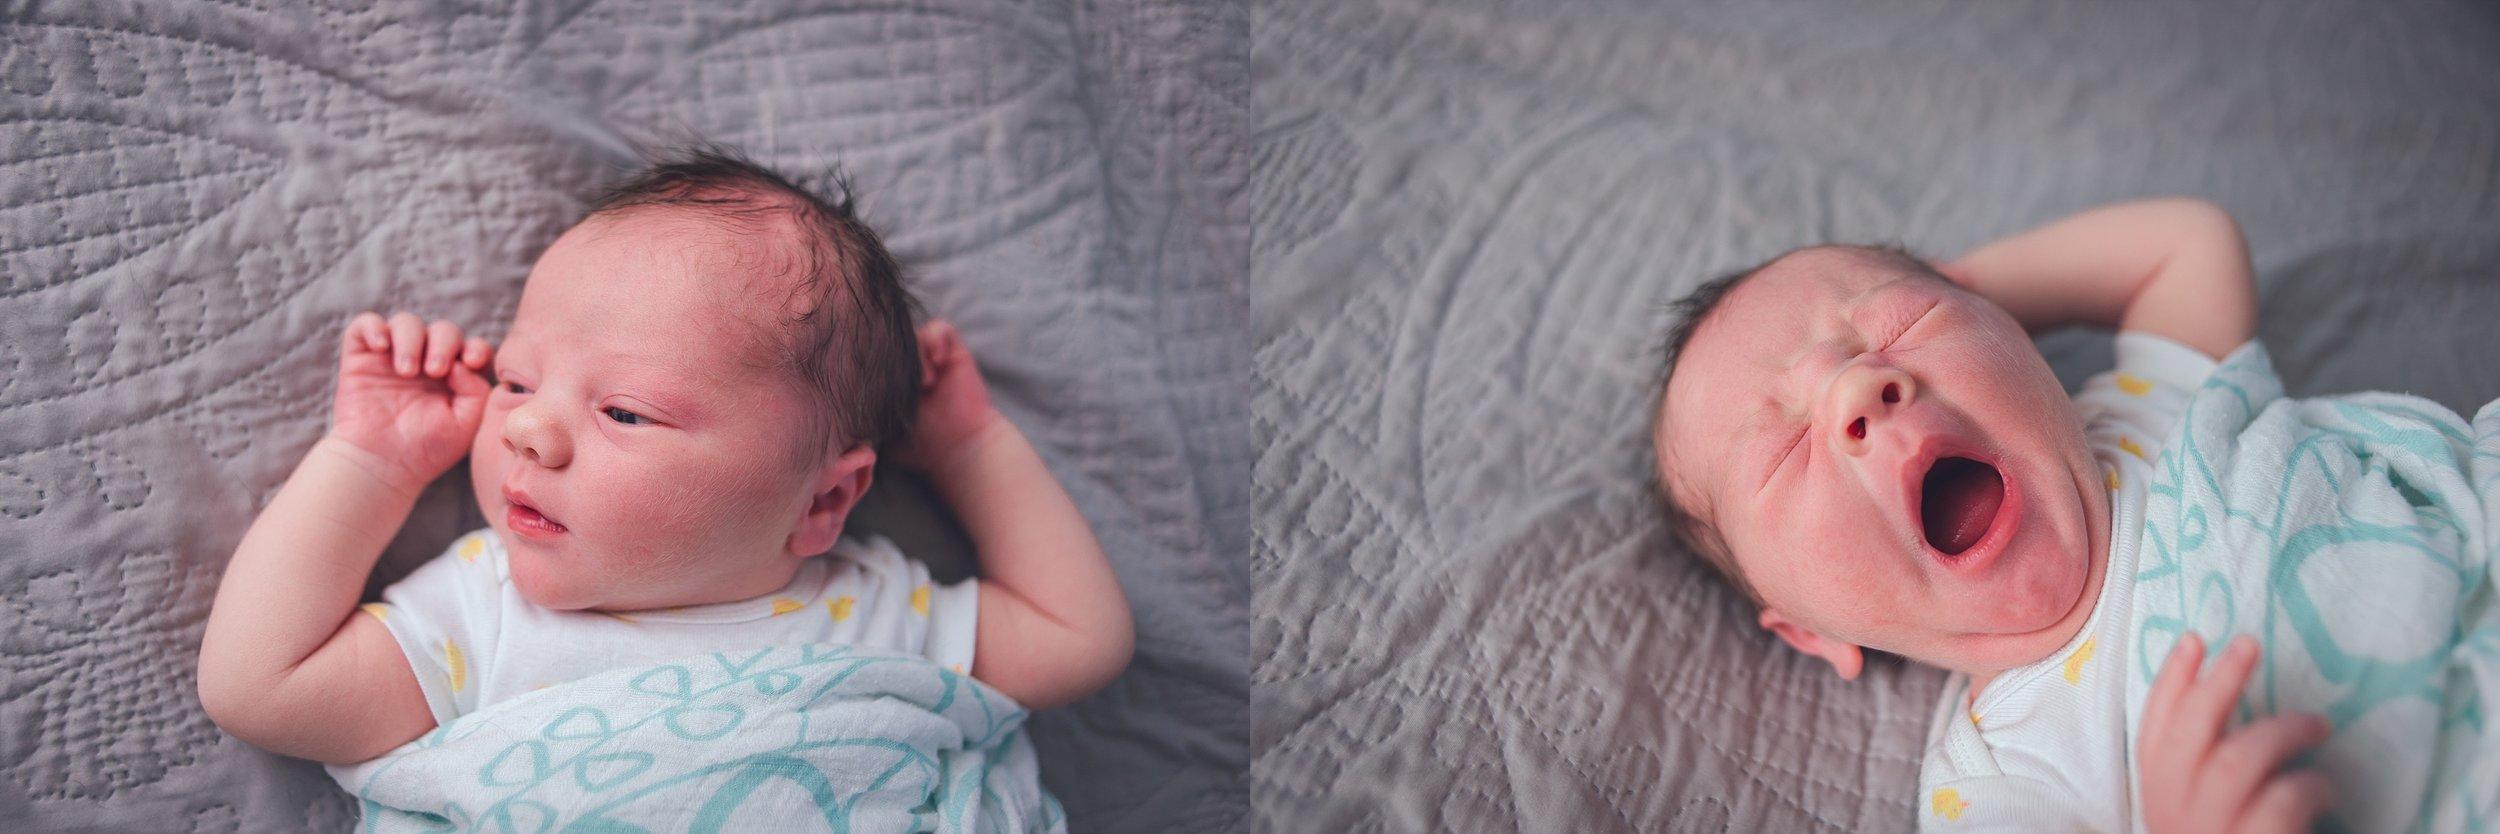 BrittneyHogue-NewbornPhotographer-FamilyPhotographer-PeoriaIL-PekinIL-MortonIL (9).jpg